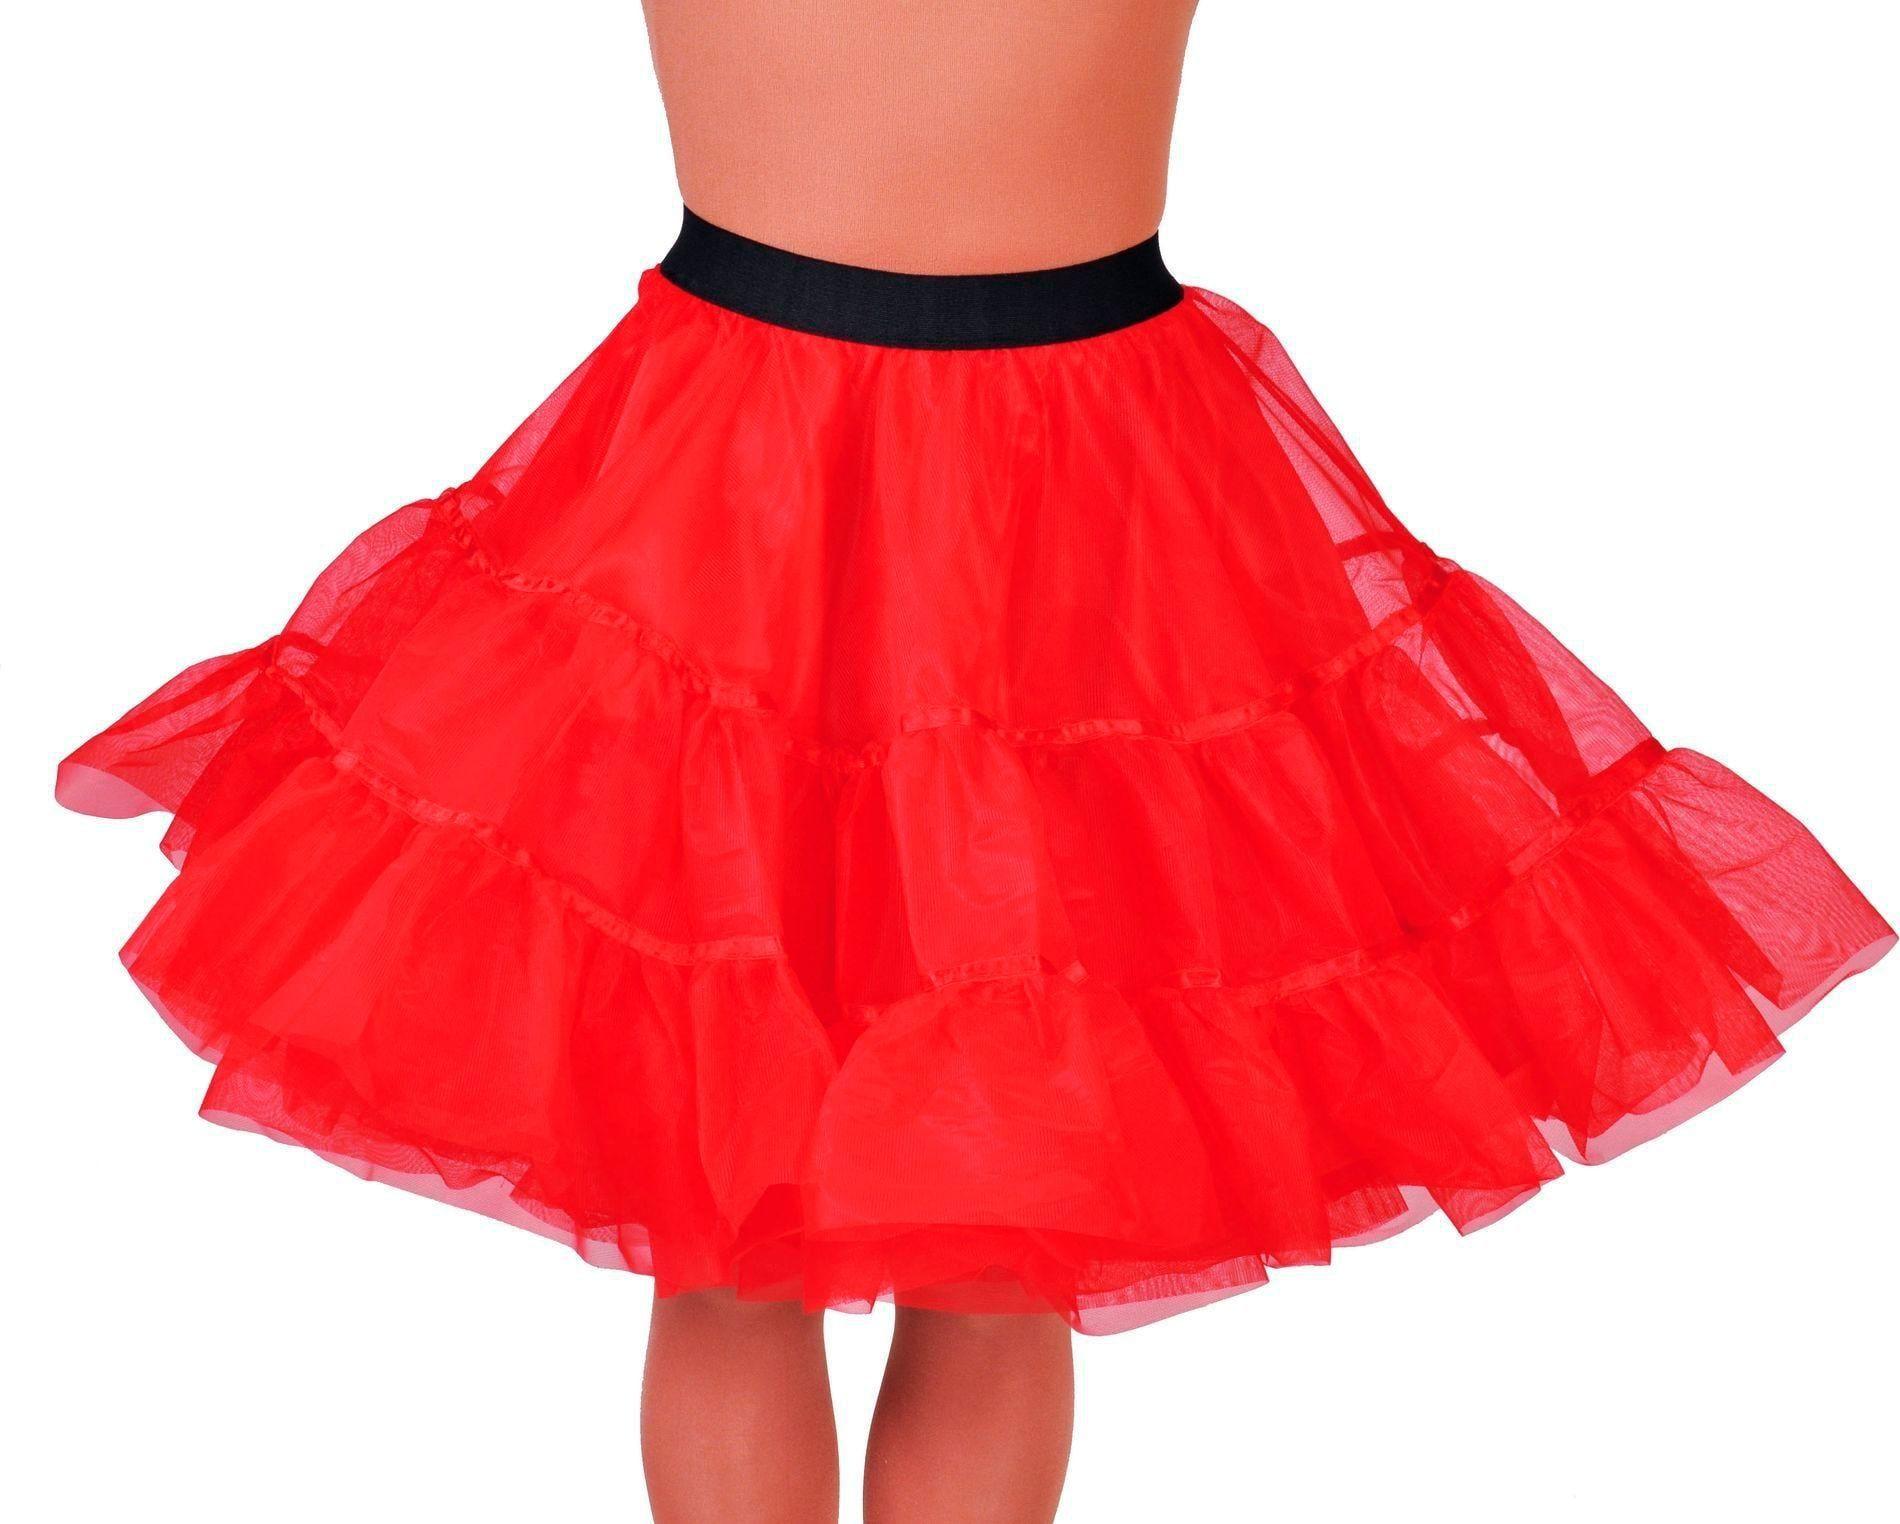 Petticoat middel lang rood dames